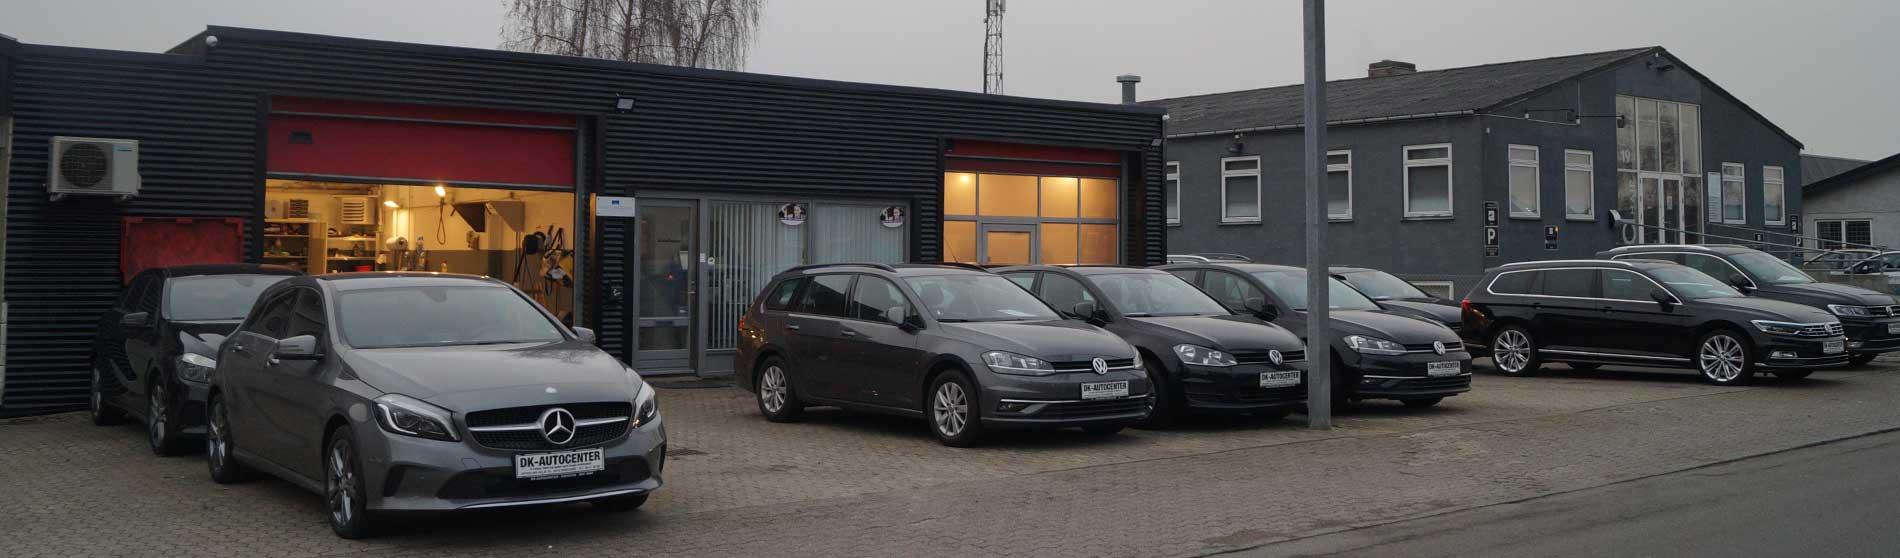 DK autocenter